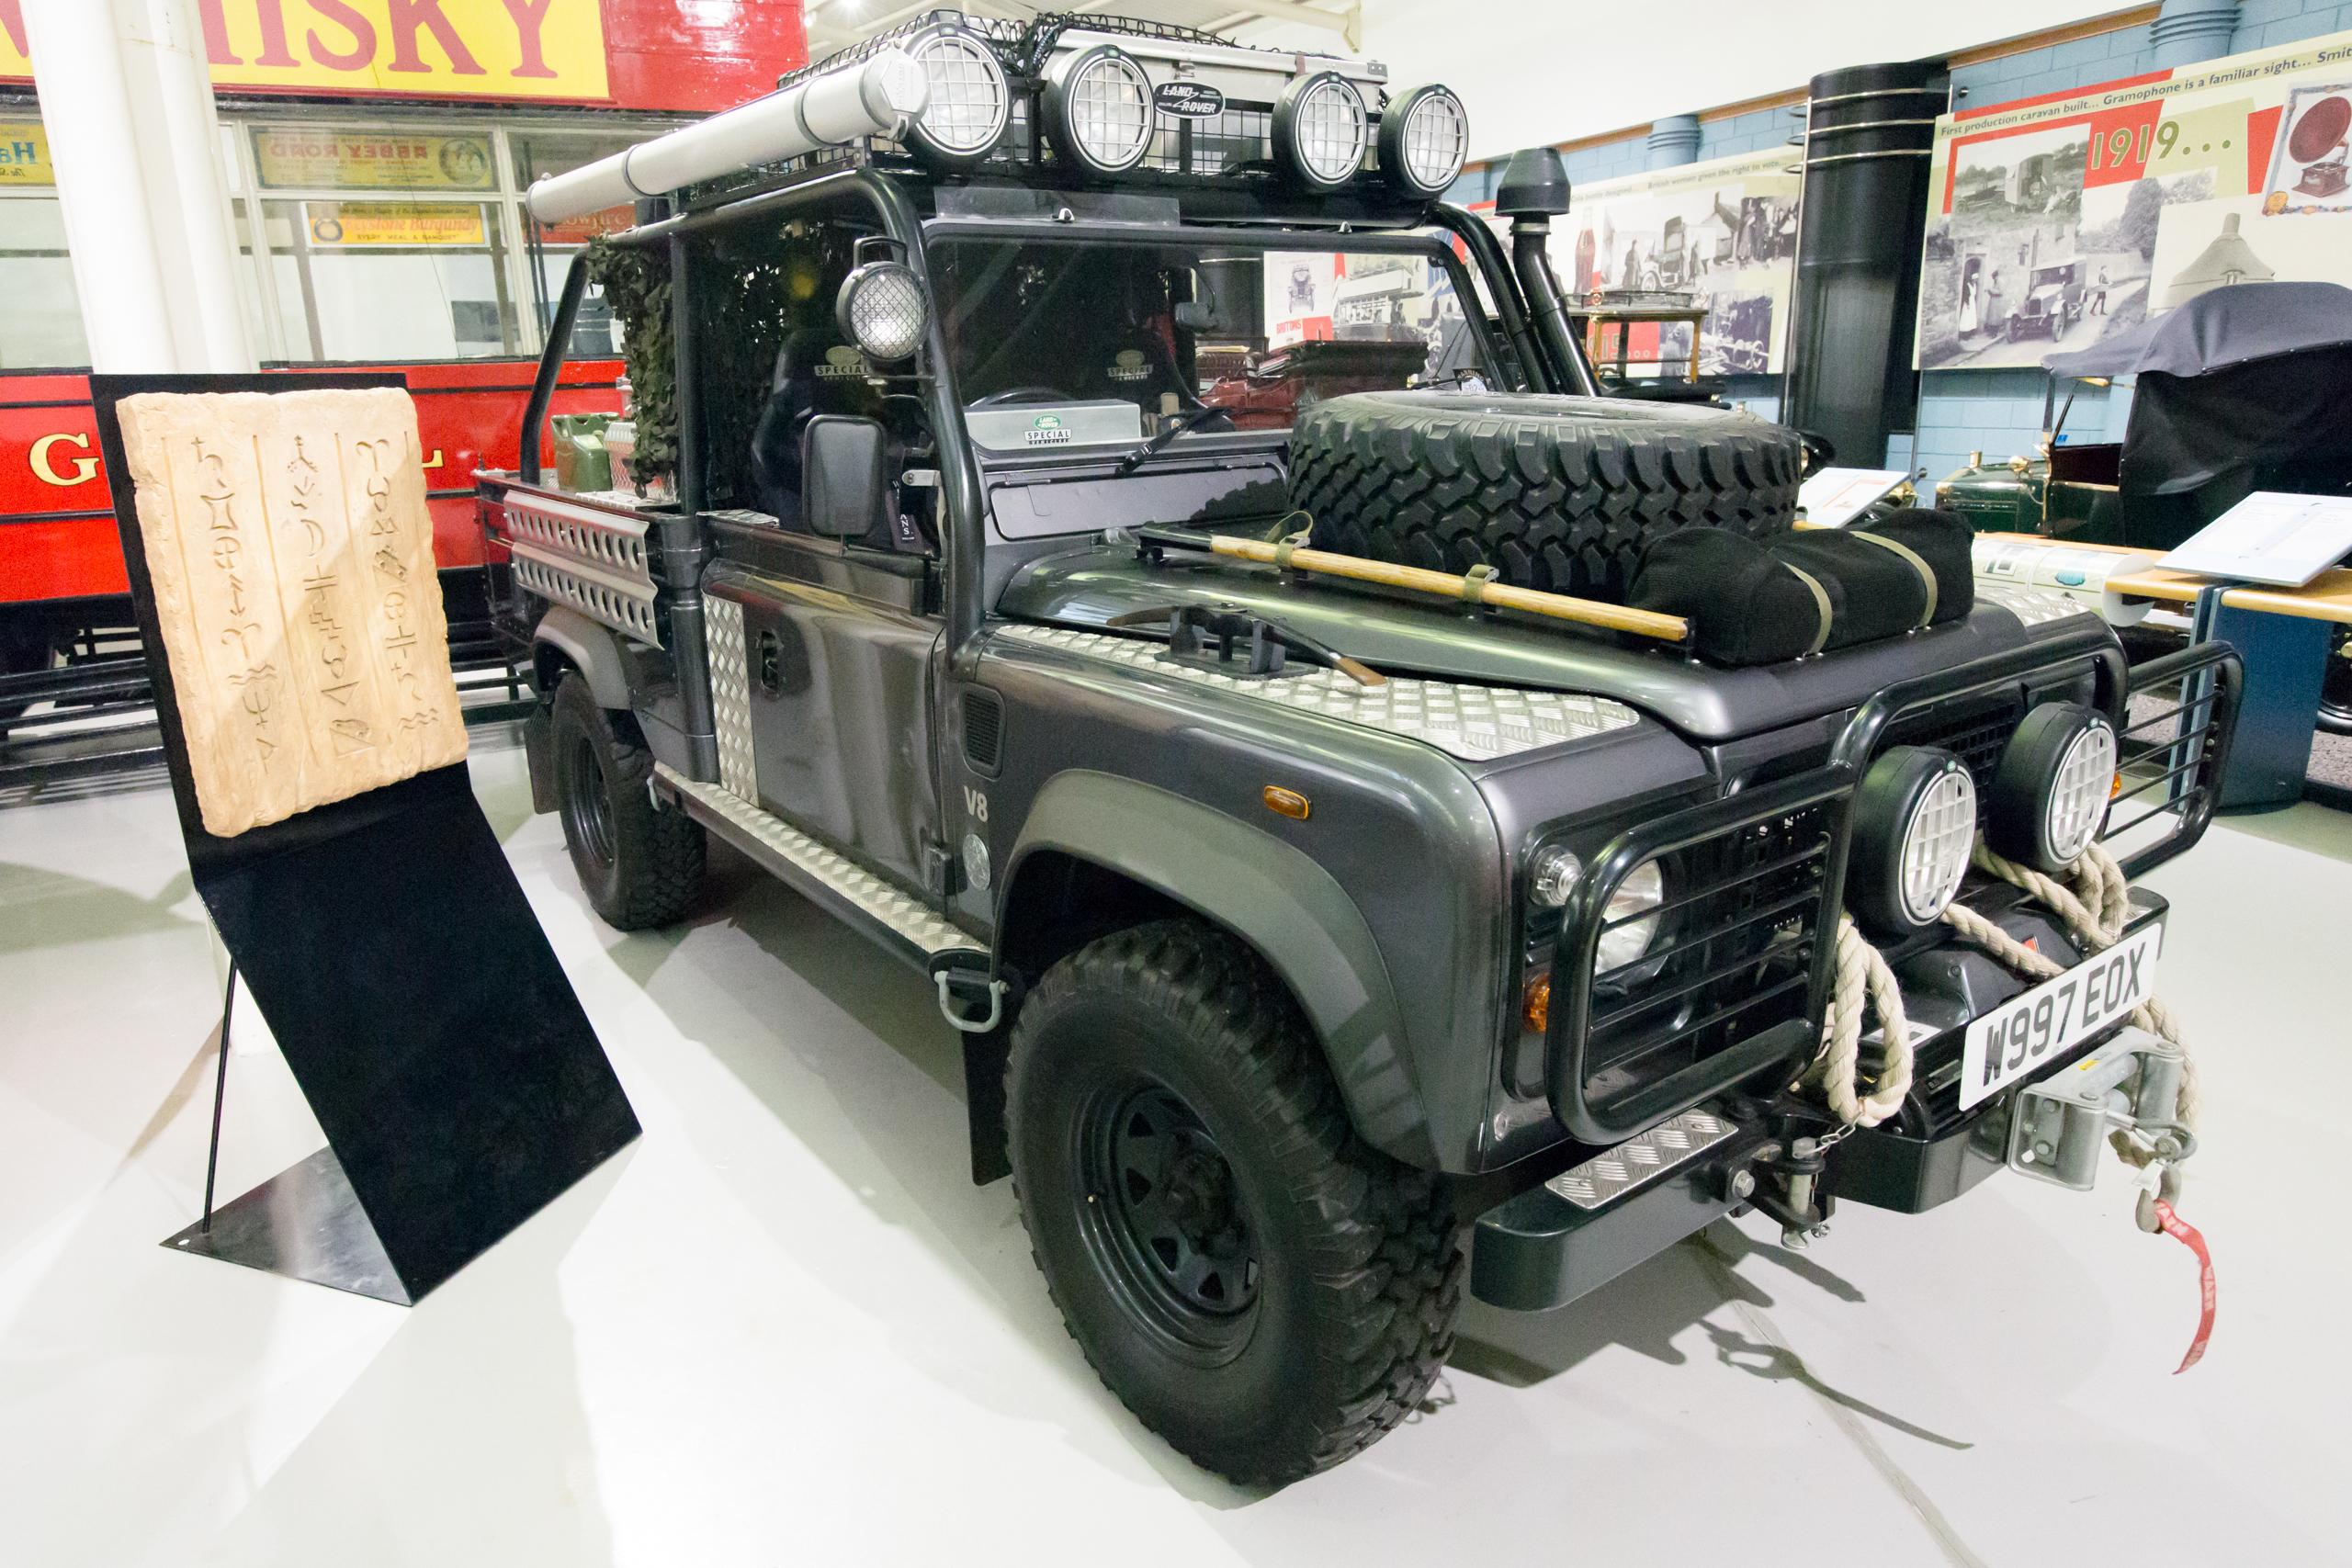 2013 land rover defender by kahn design youtube - Tomb Raider Defender Car Modifiers Kahn Design